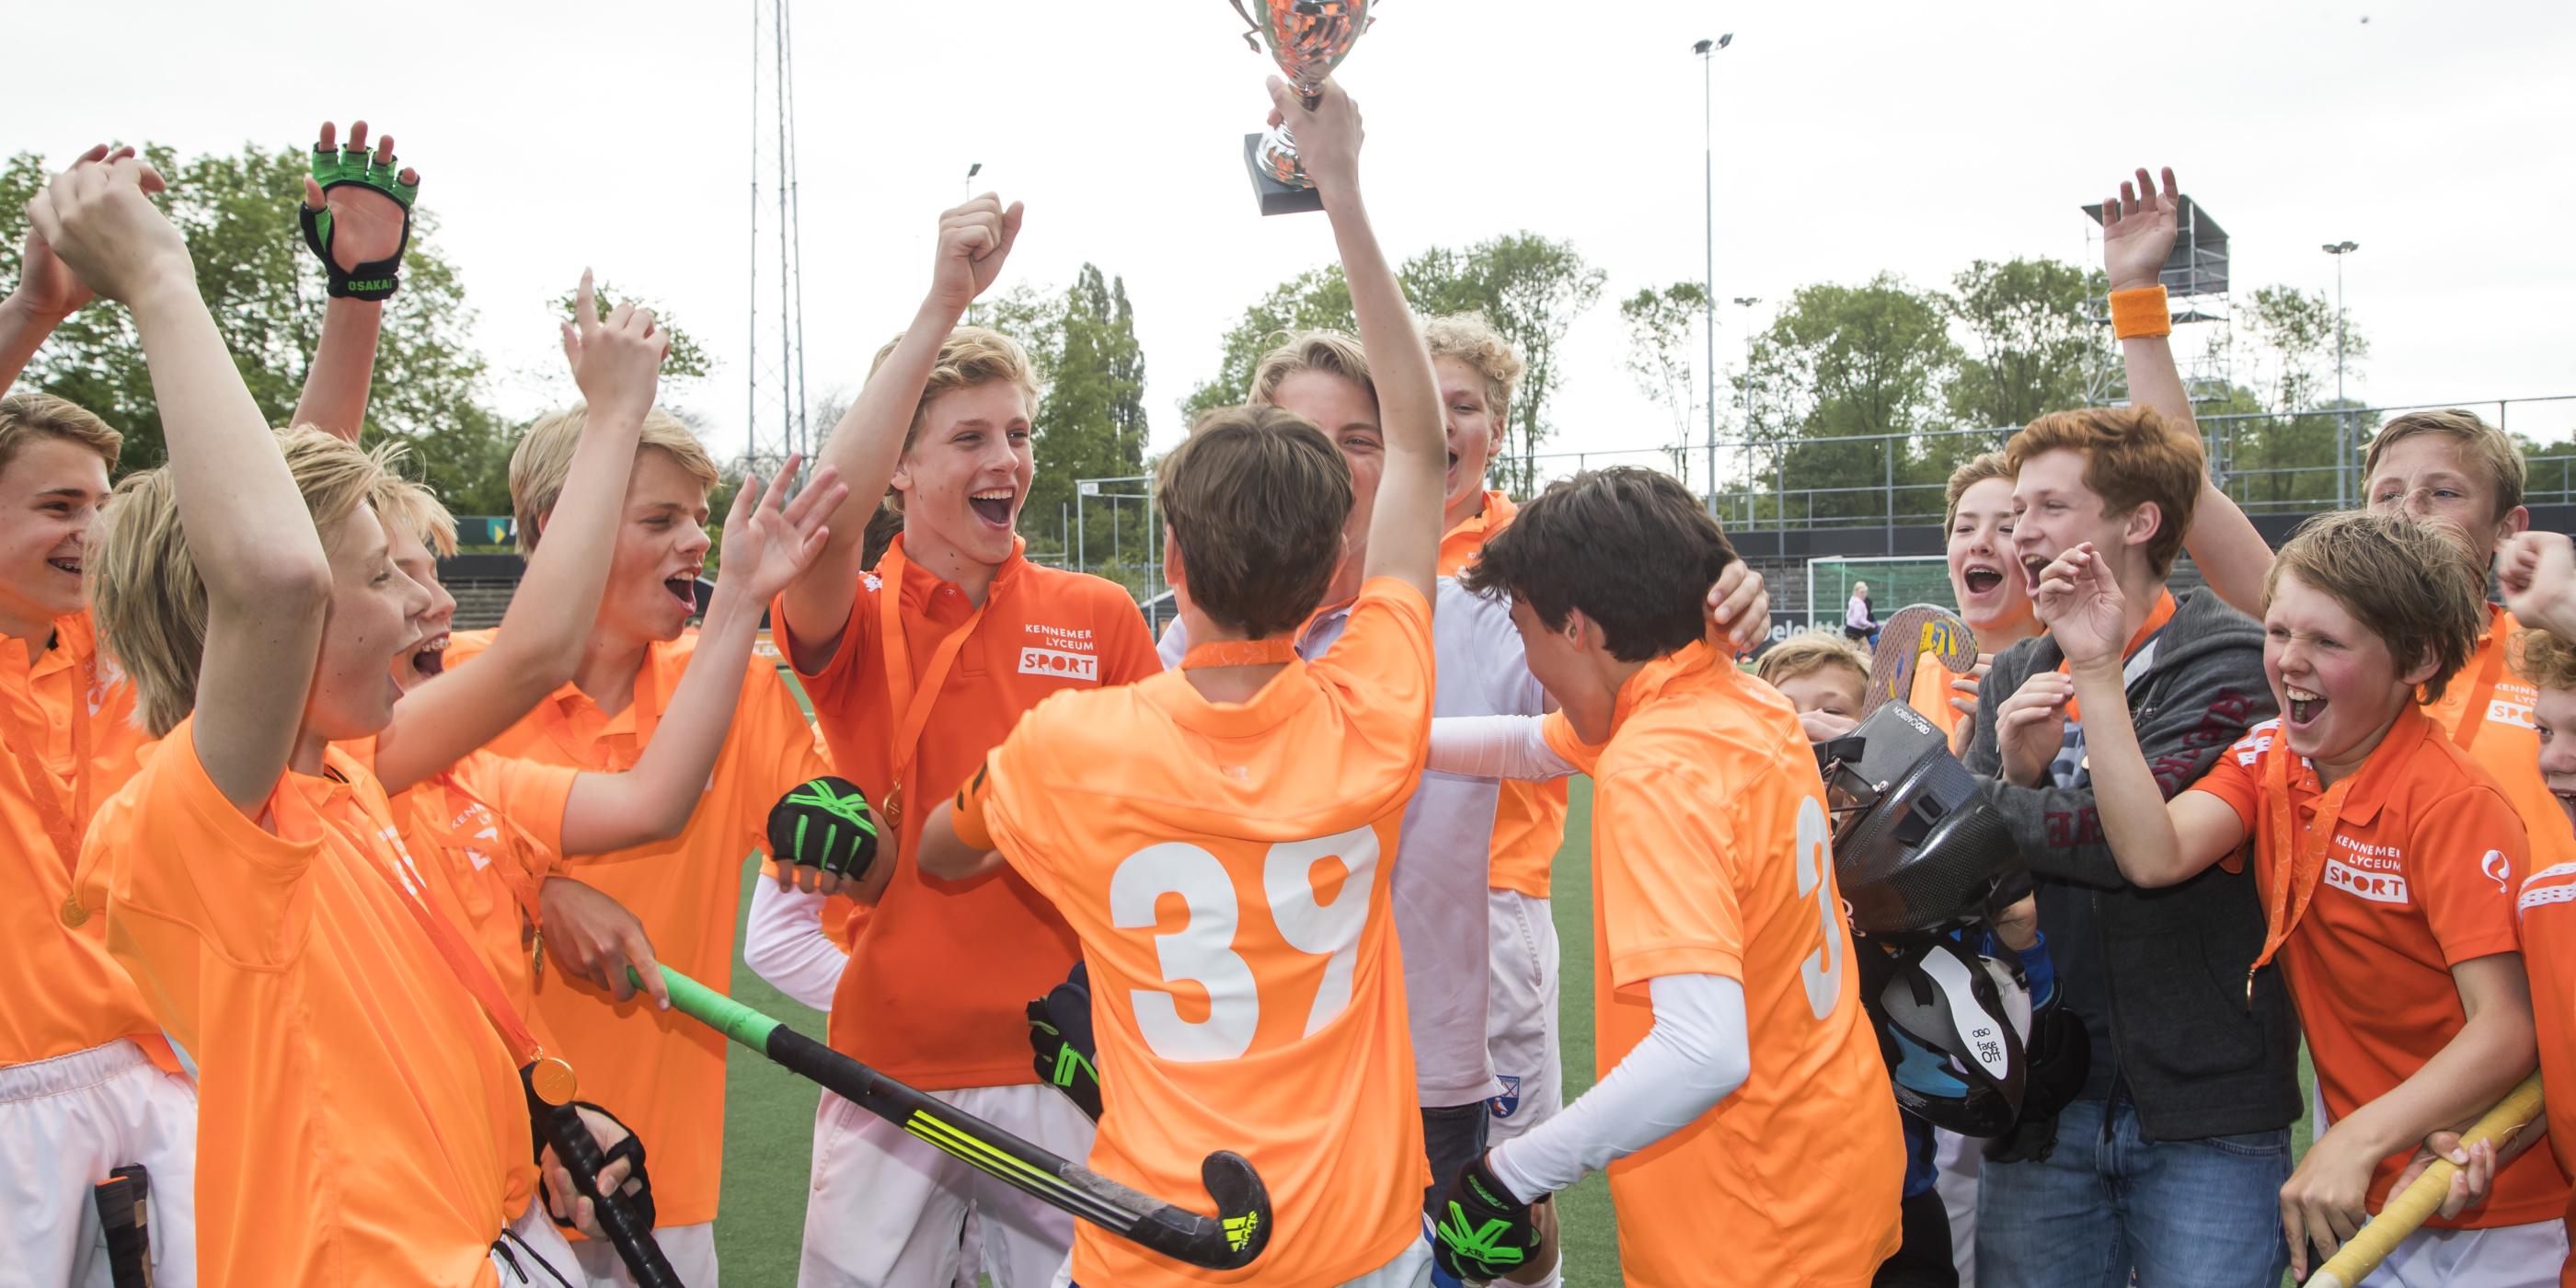 Inschrijving Nationale Schoolhockeycompetitie 2019 gestart